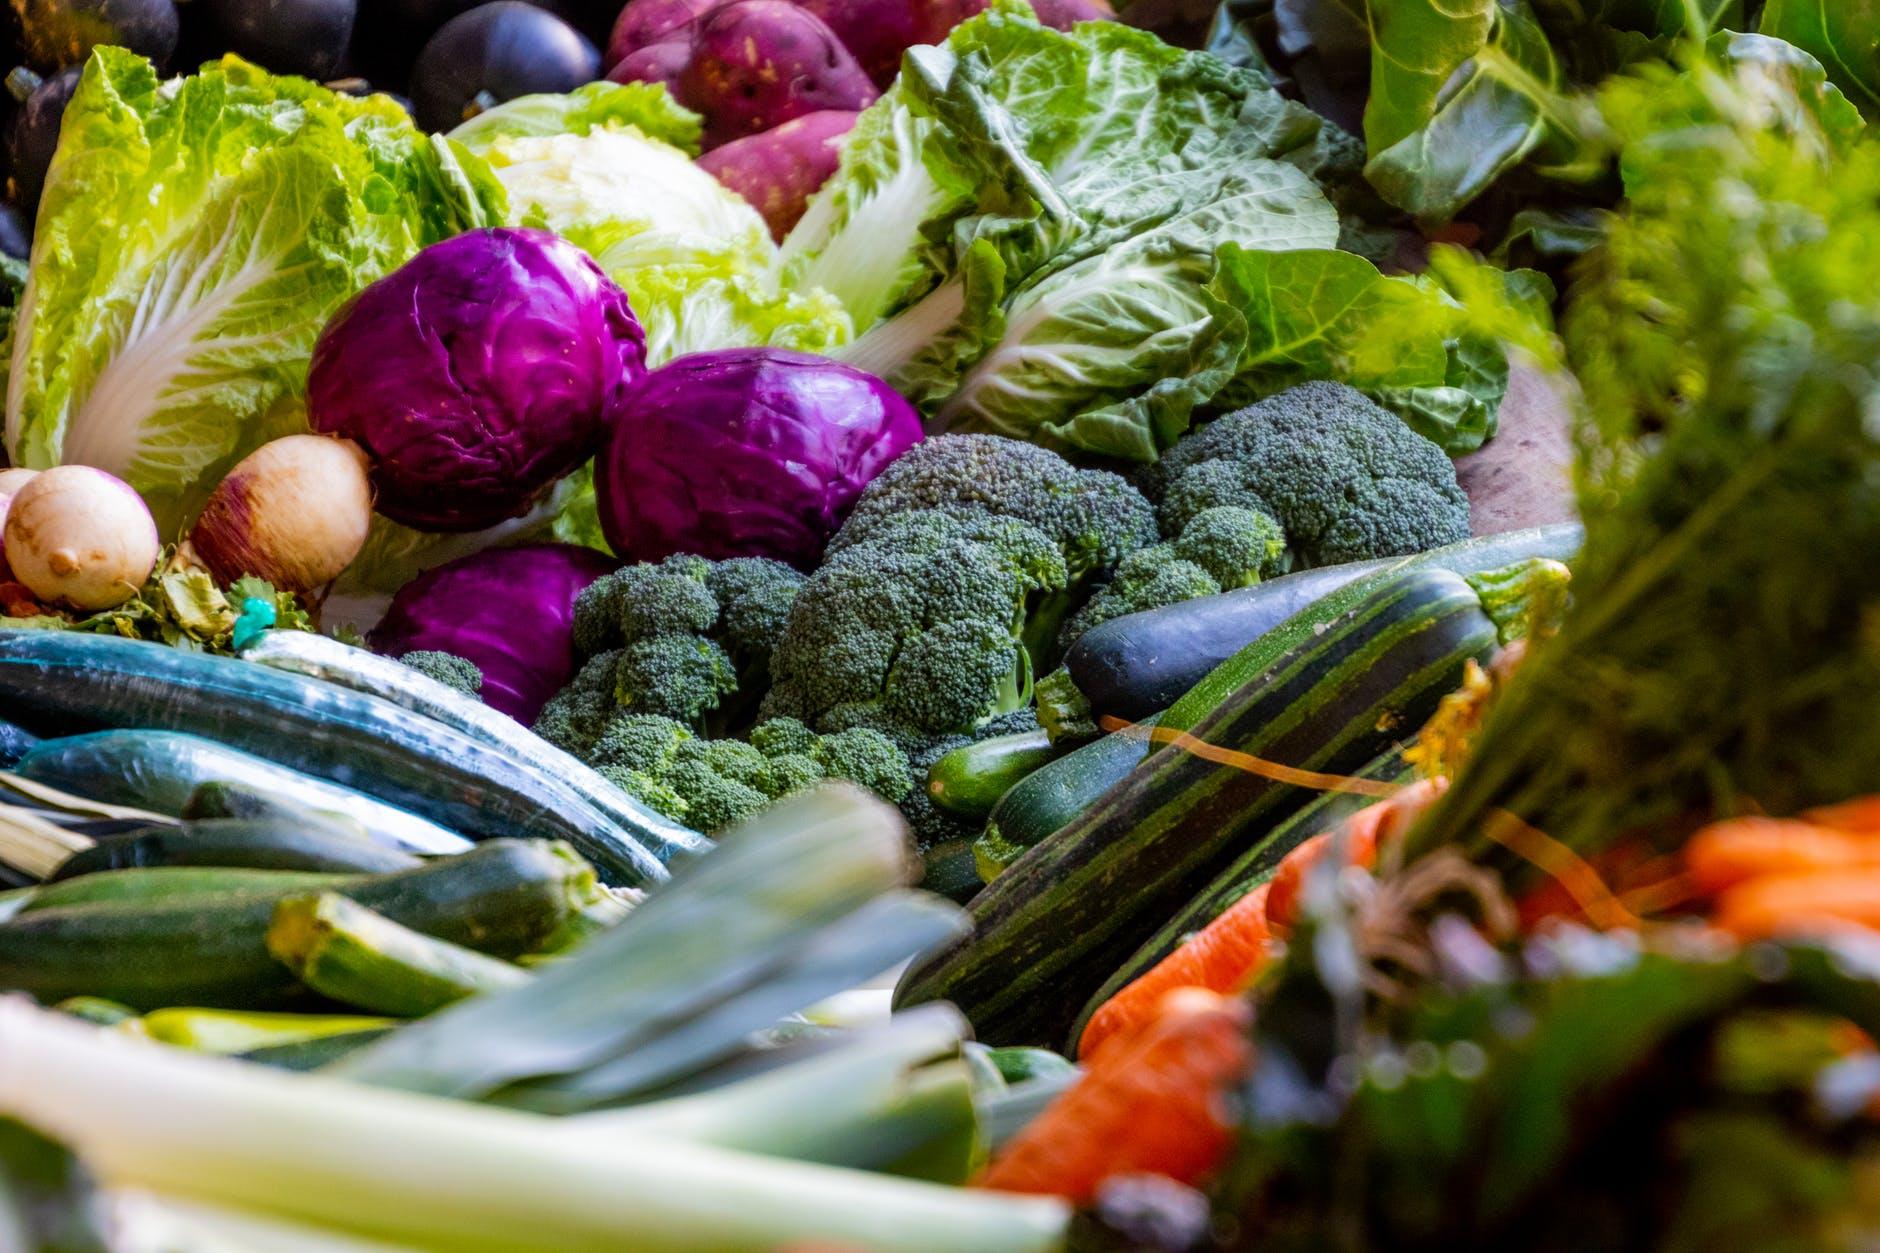 verdura-mercato-sociale